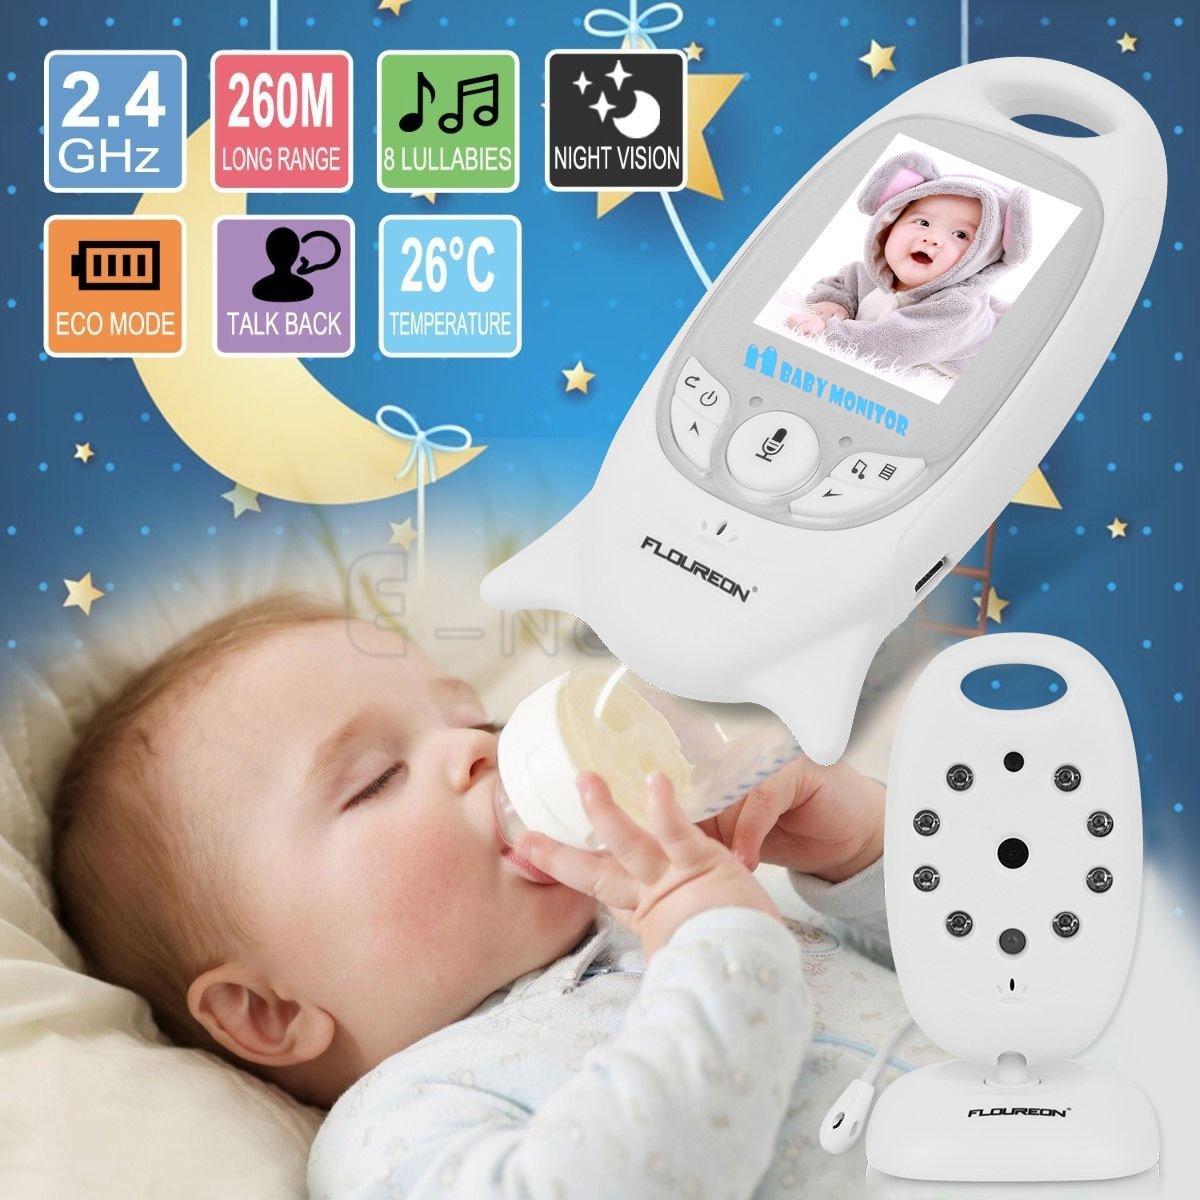 FLOUREON 2.0 Inch WIFI Baby Monitor Infant IR LCD Video Nanny Security Camera Temperature Display 2 Way Talk Night Vision Lullabies (2.0\